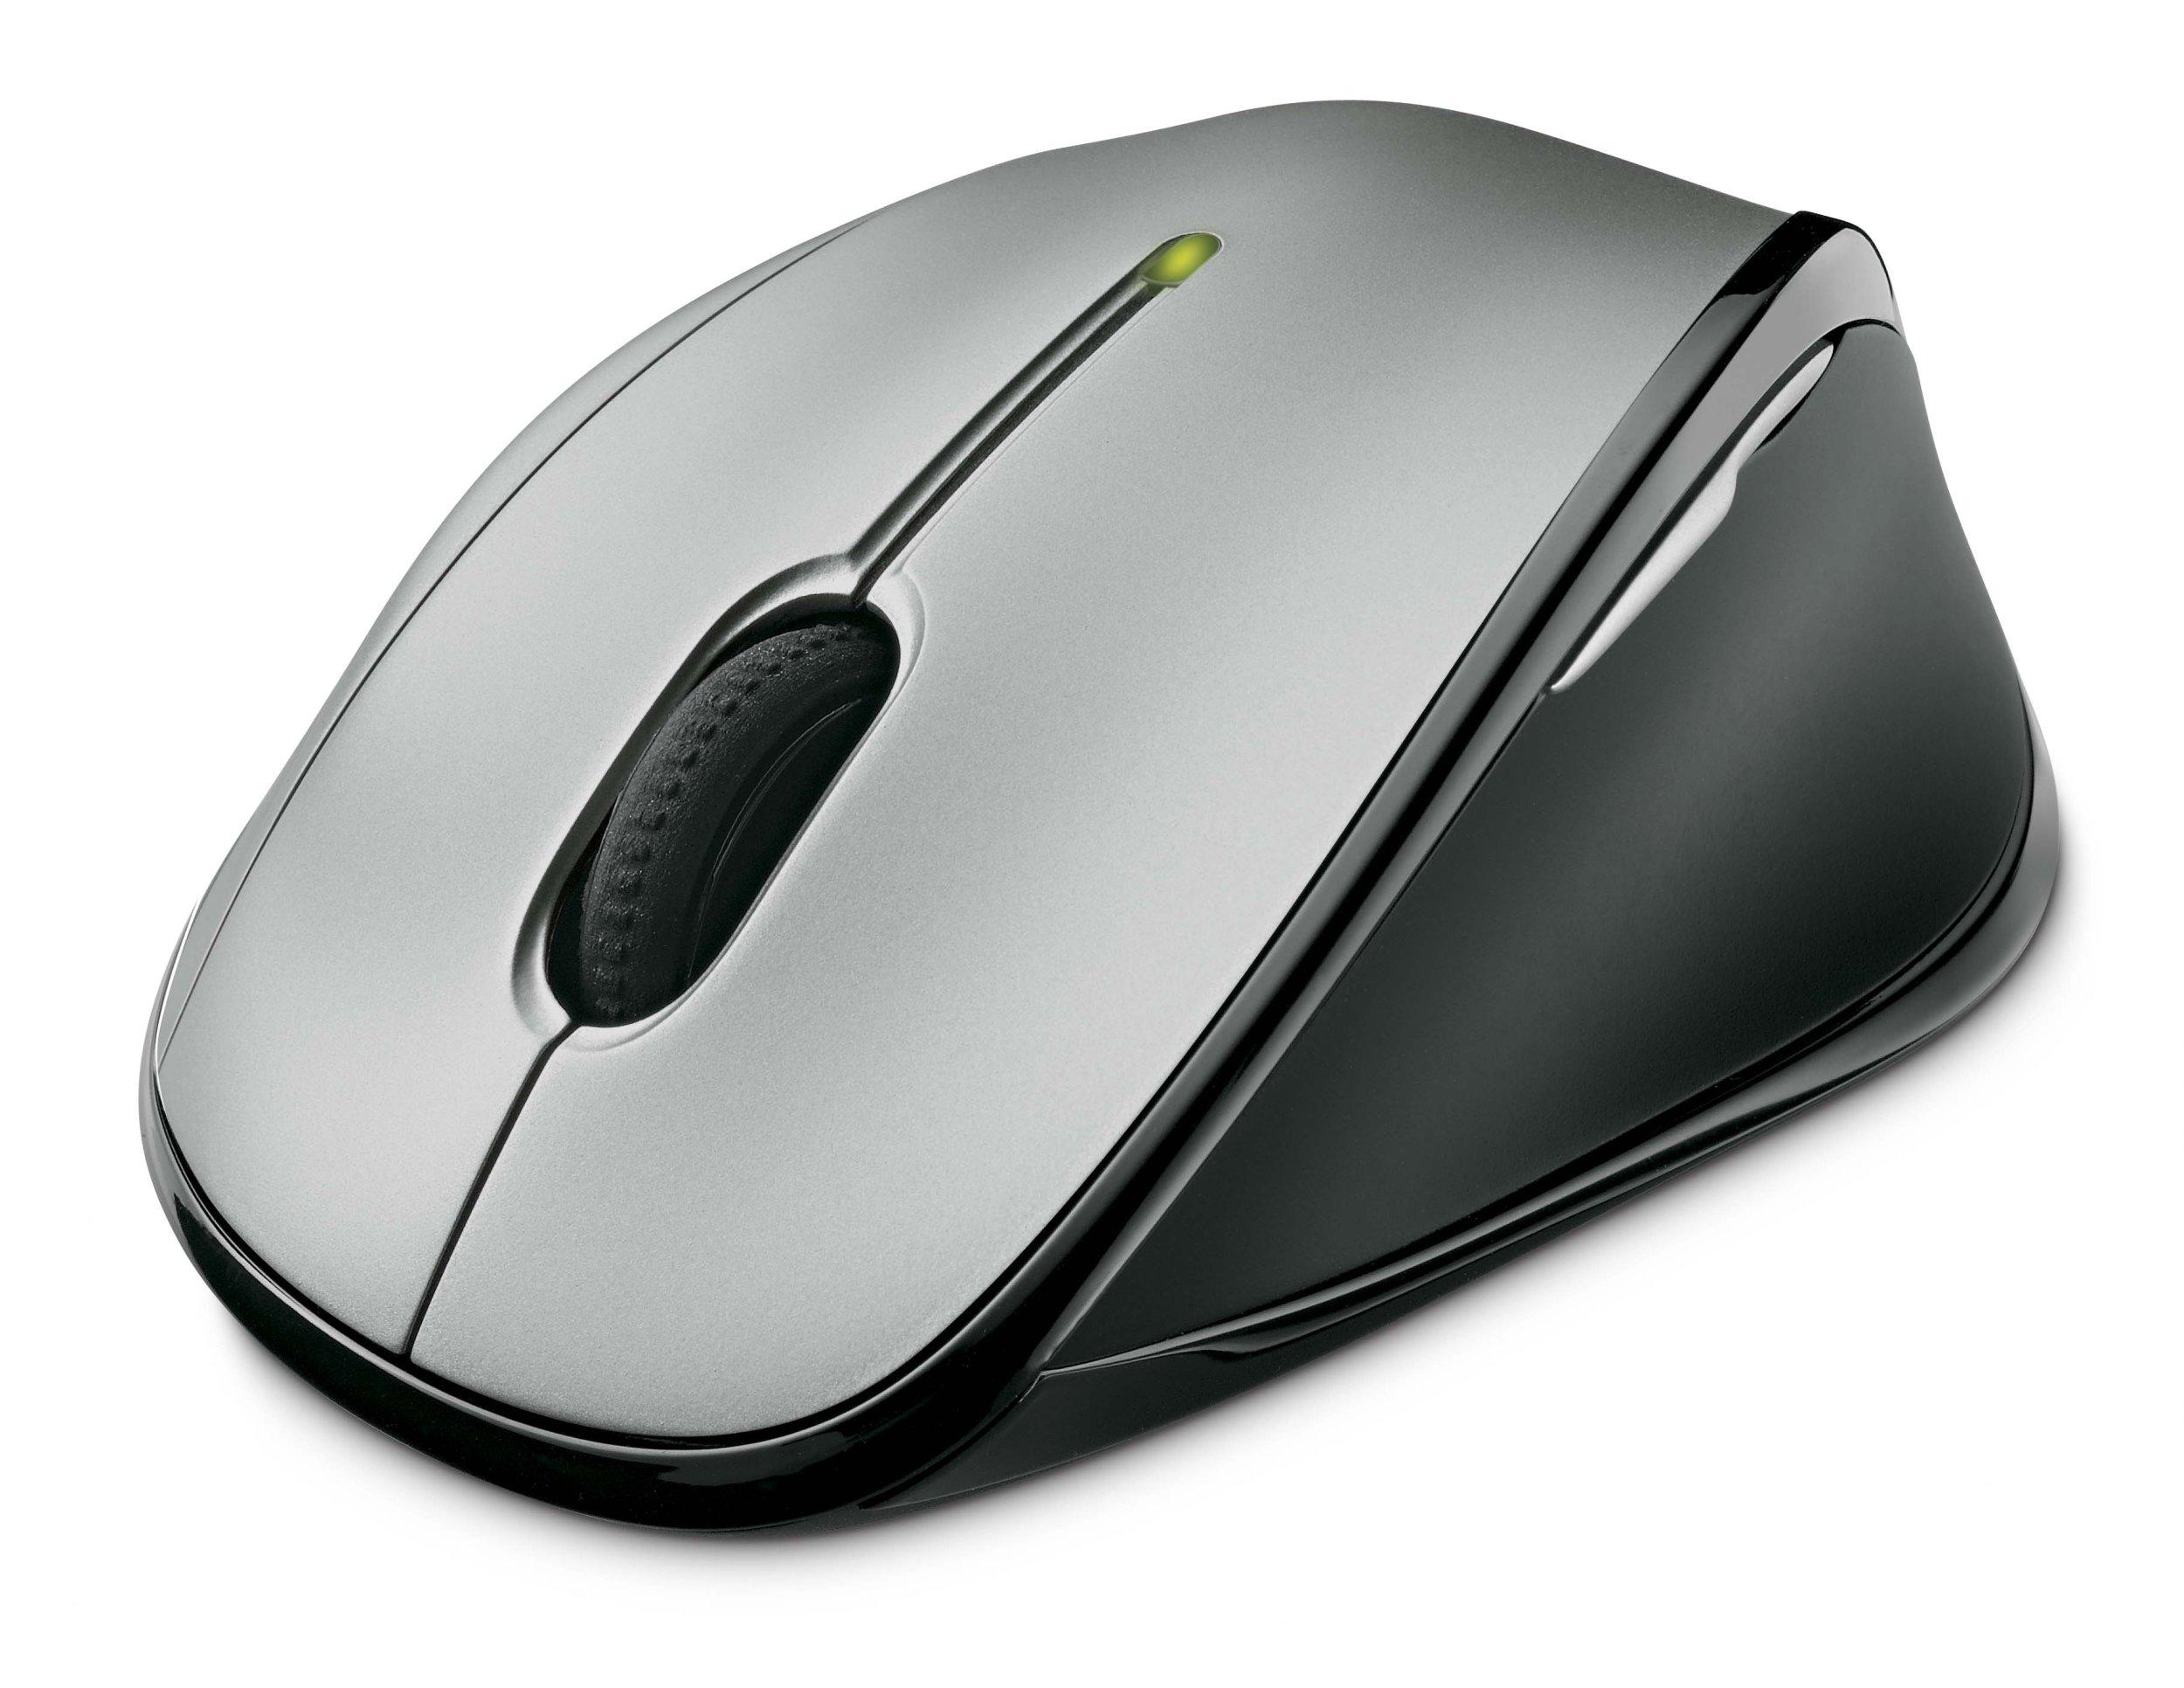 Microsoft Wireless Laser Mouse 6000 V2.0 Mac/Windows USB